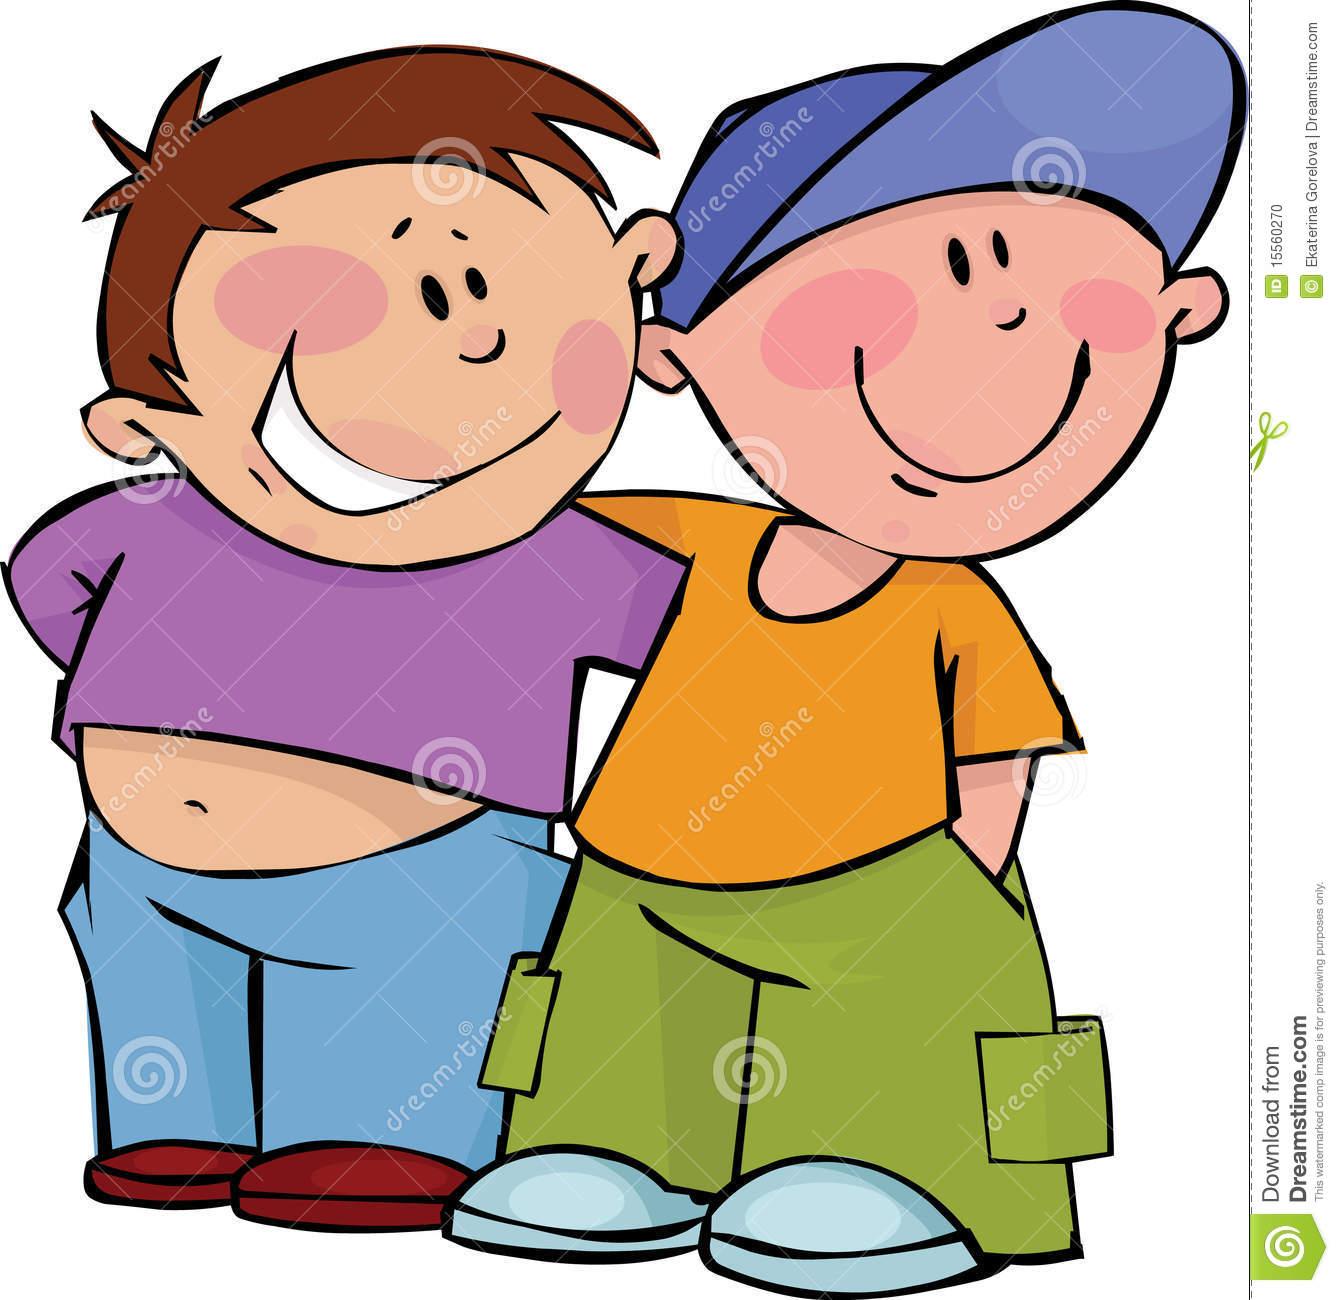 Kids friendly clipart site - ClipartFest jpg stock